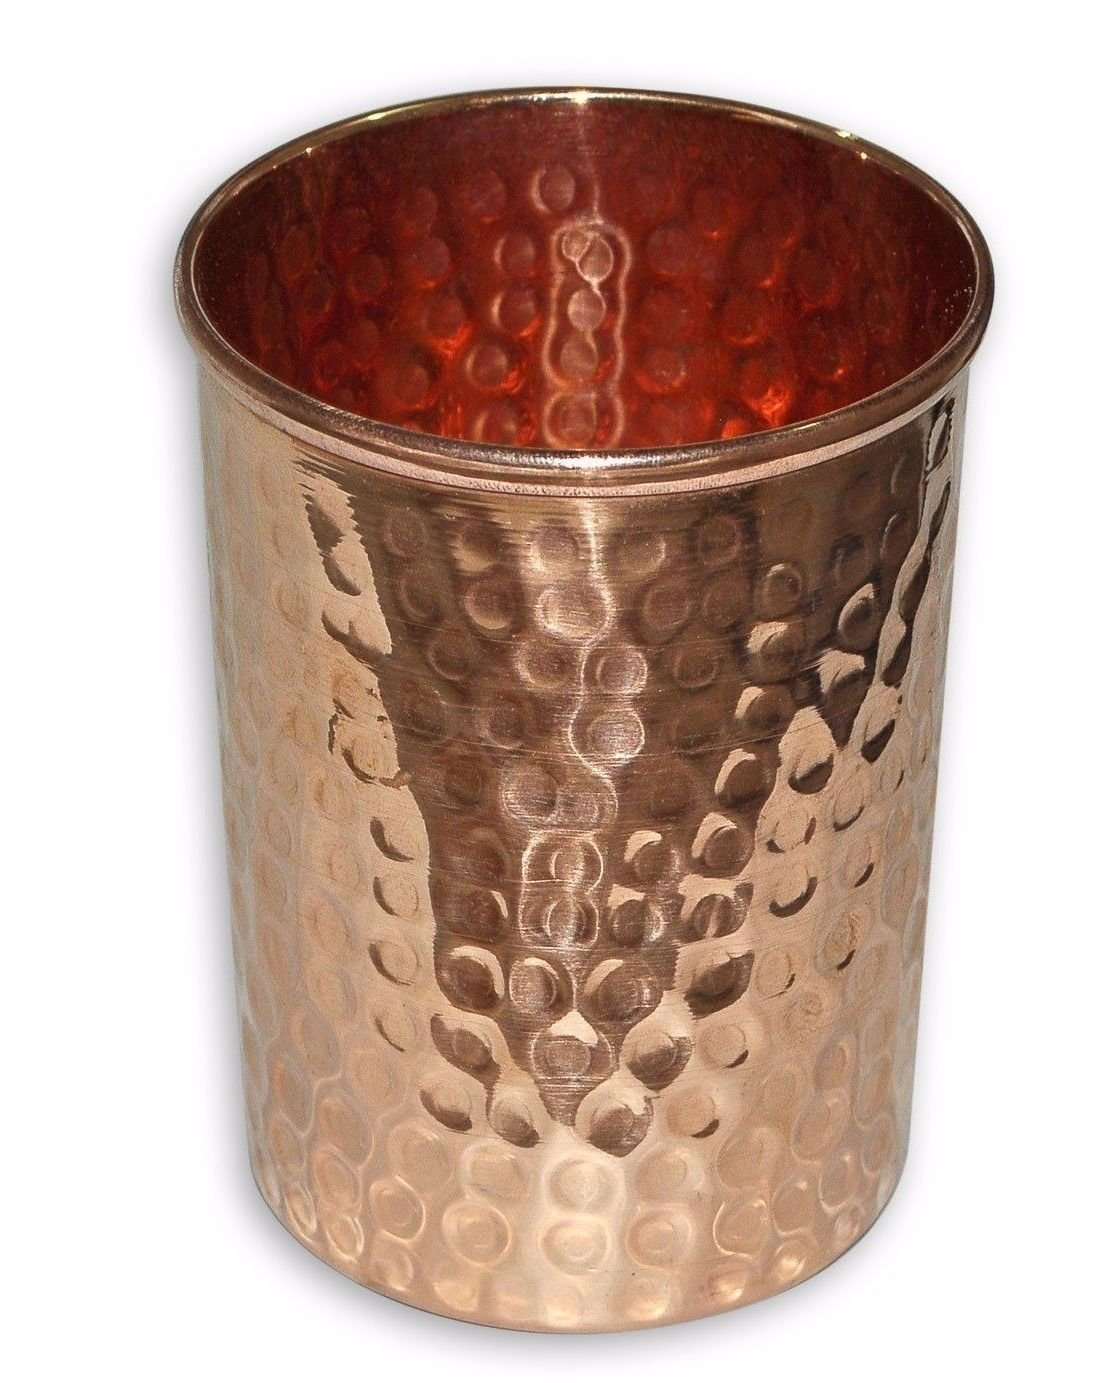 Rastogi Handicrafts Hammered Pure Copper 12 ltr. Water Pot Storage Tank - Tumble With Tap Kitchen Home Garden